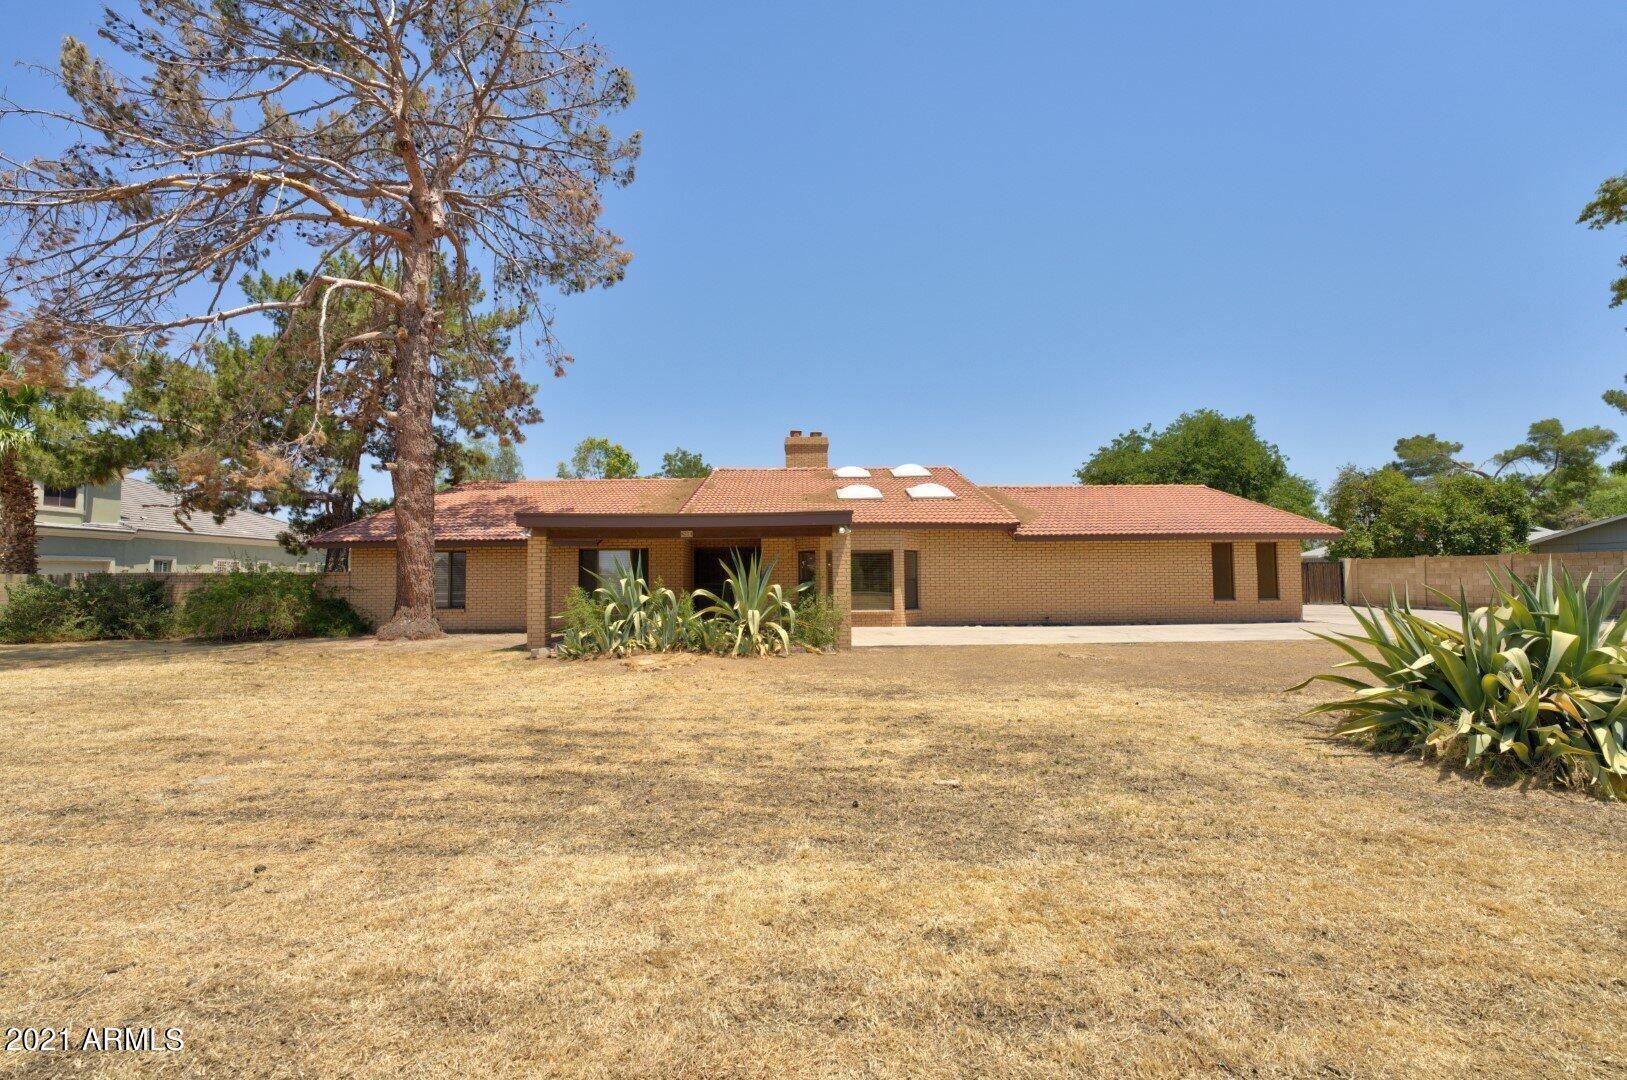 Photo of 8214 W ACOMA Drive, Peoria, AZ 85381 (MLS # 6248384)